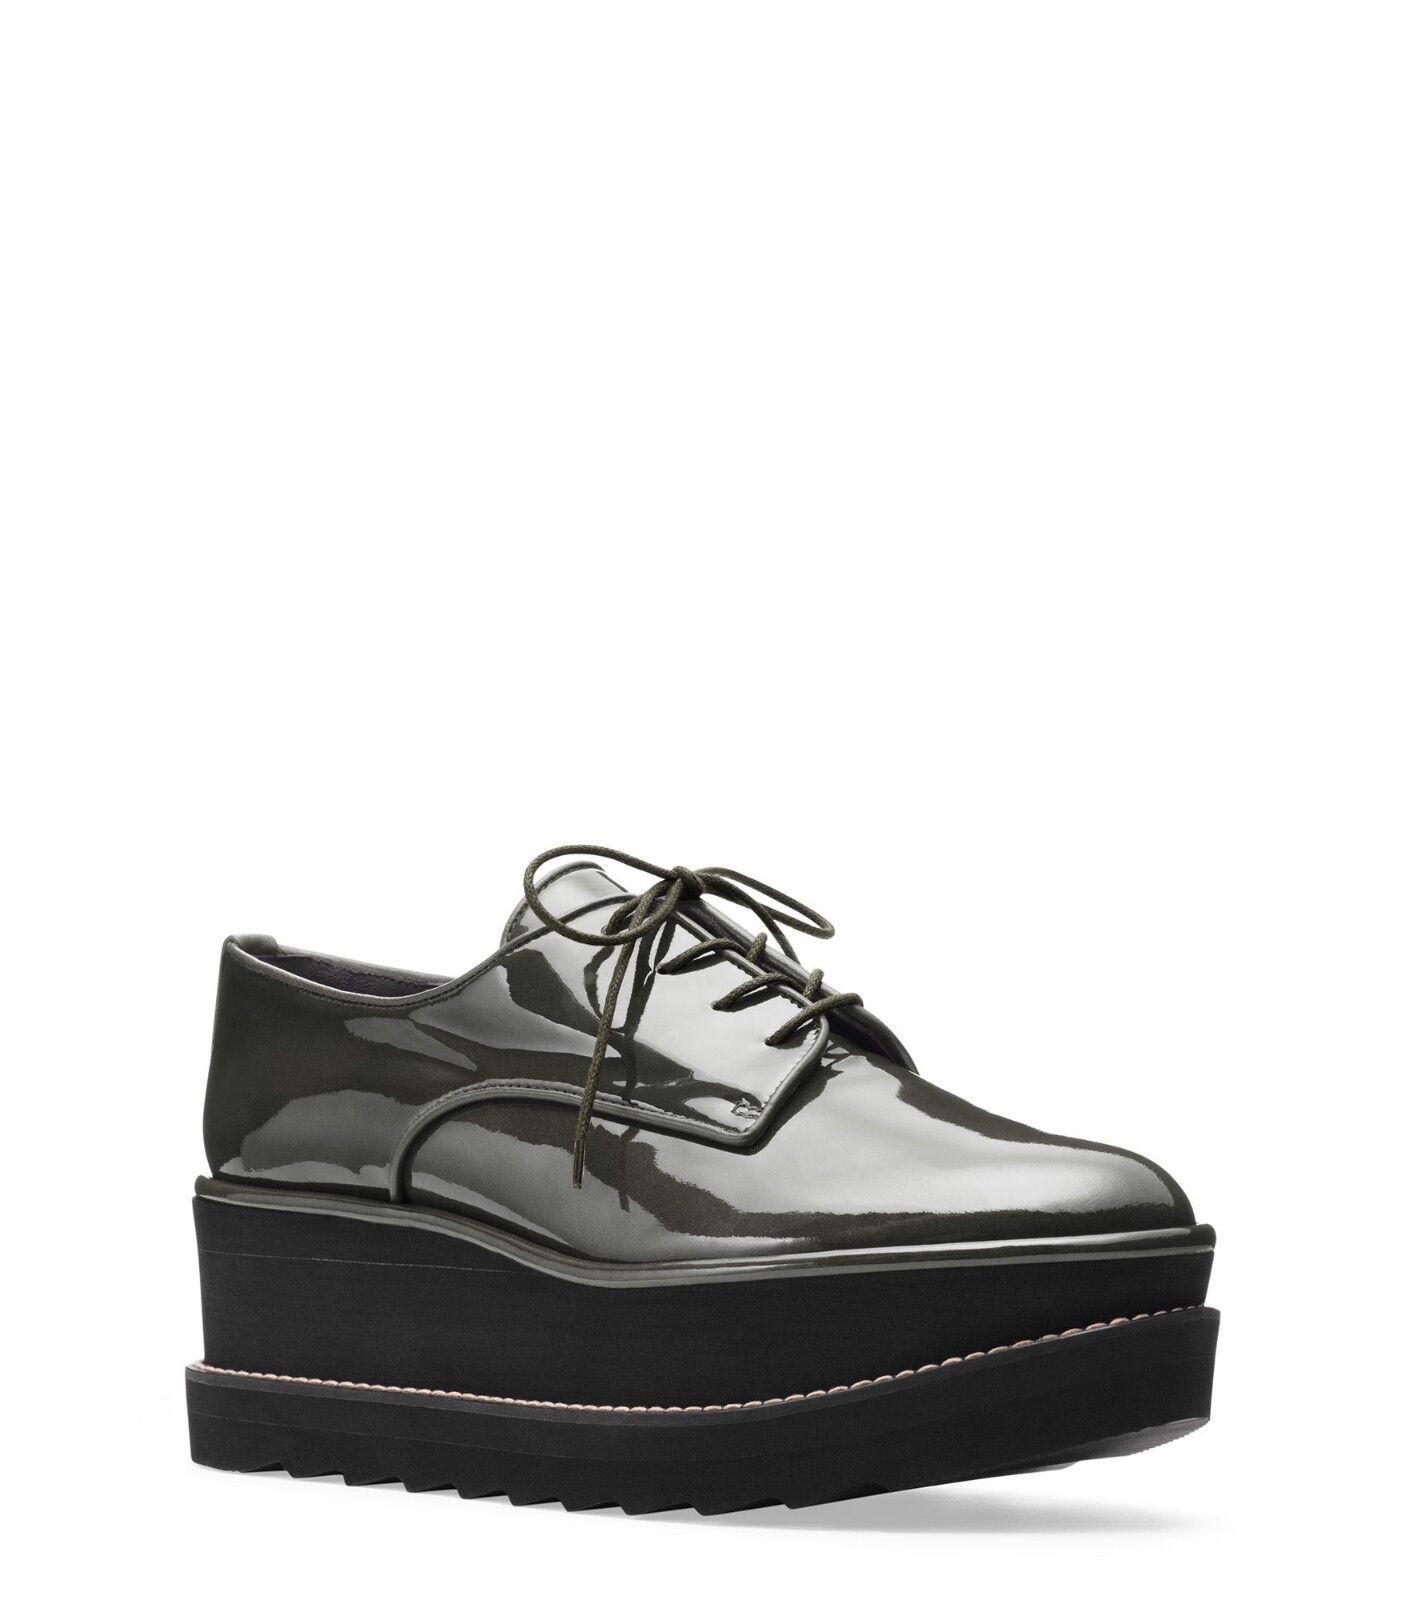 598 Auténtico Raro Stuart zapatos Weitzman para mujer zapatos Stuart oxfords Metálico Kent plataforma 8a409d